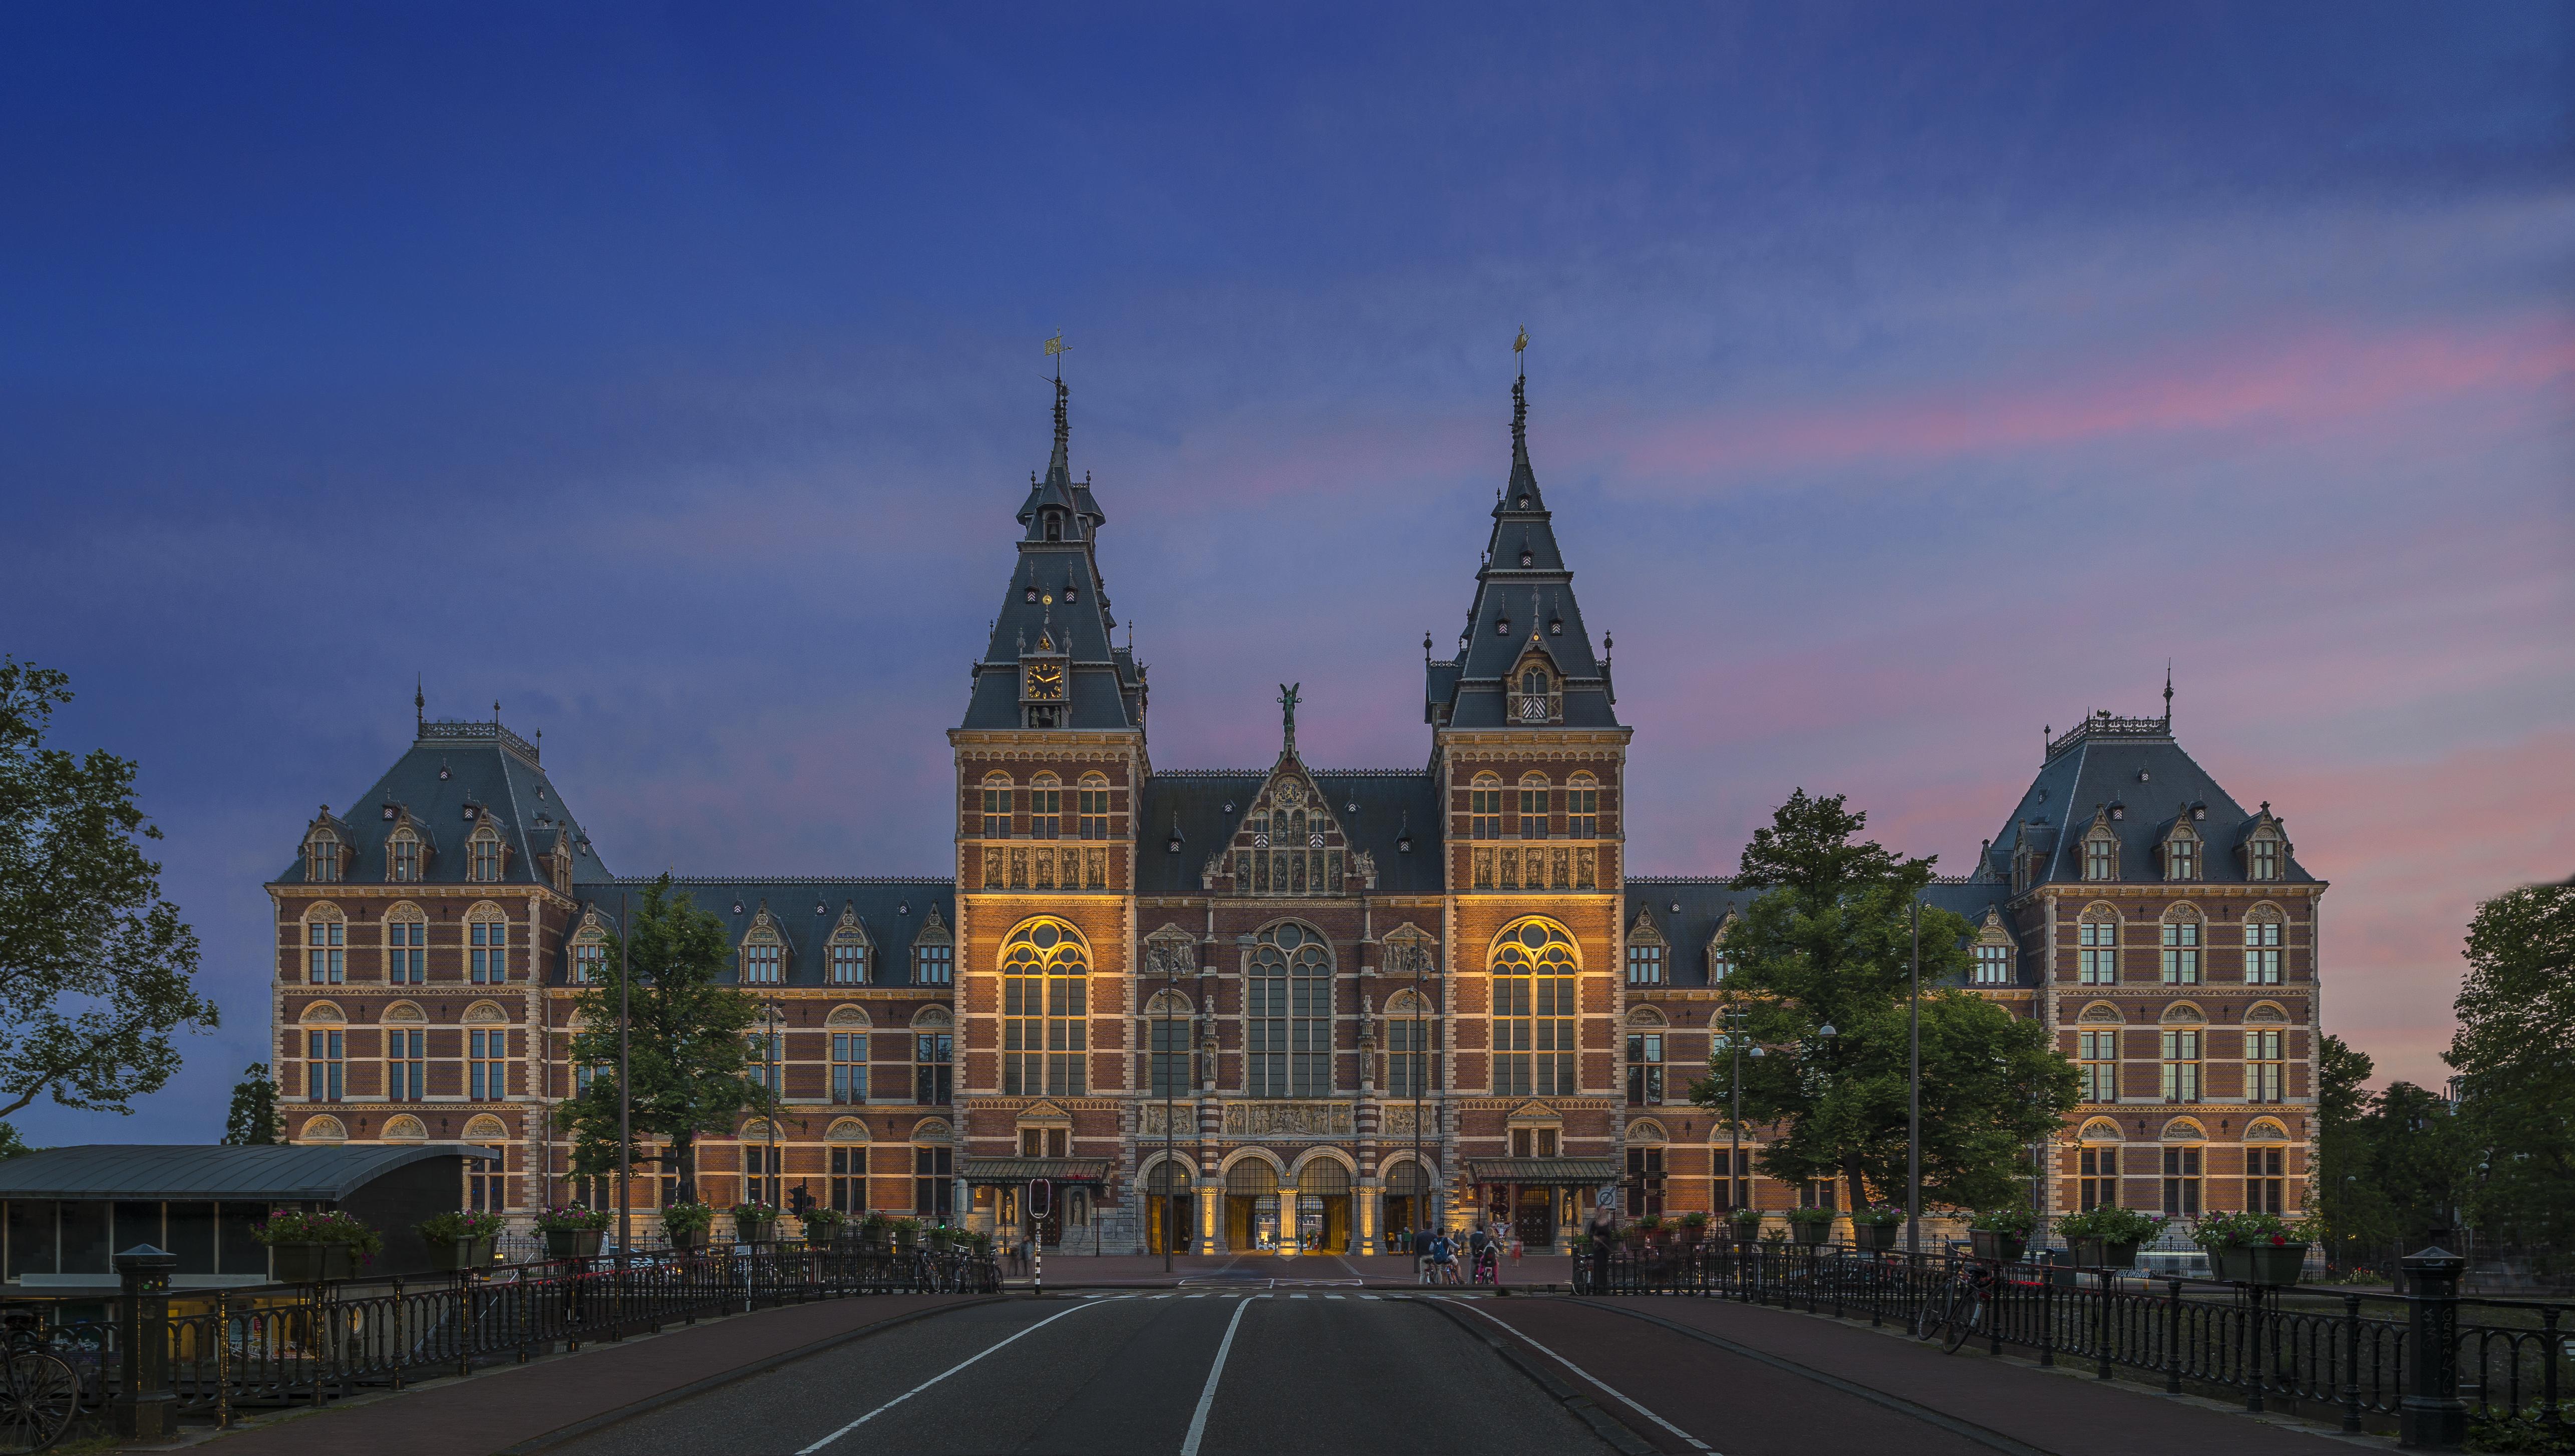 Rijksmuseum - 2014